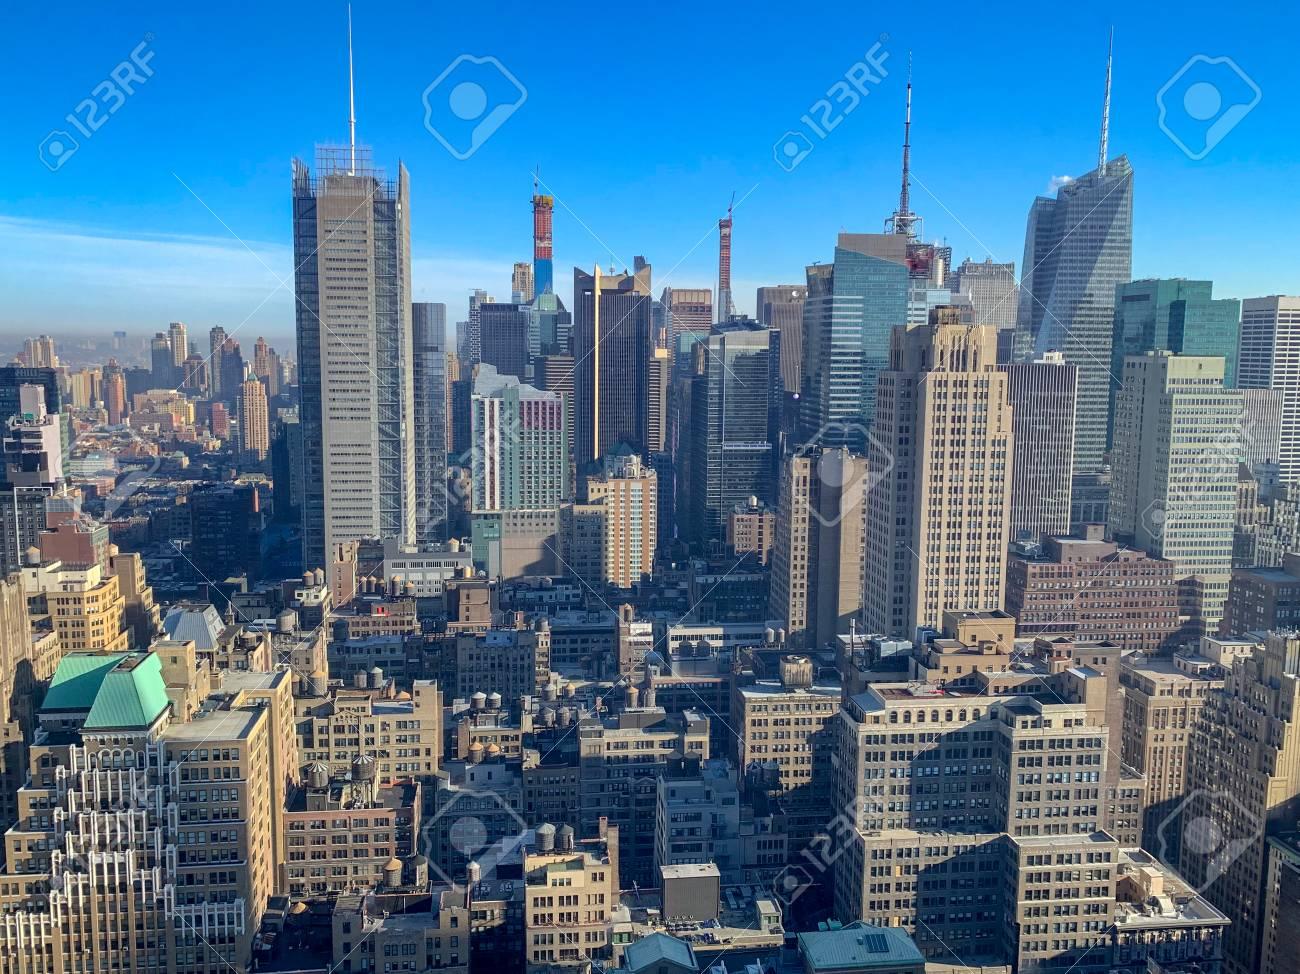 Panoramic view of the New York City skyline and Midtown Manhattan. - 122001690